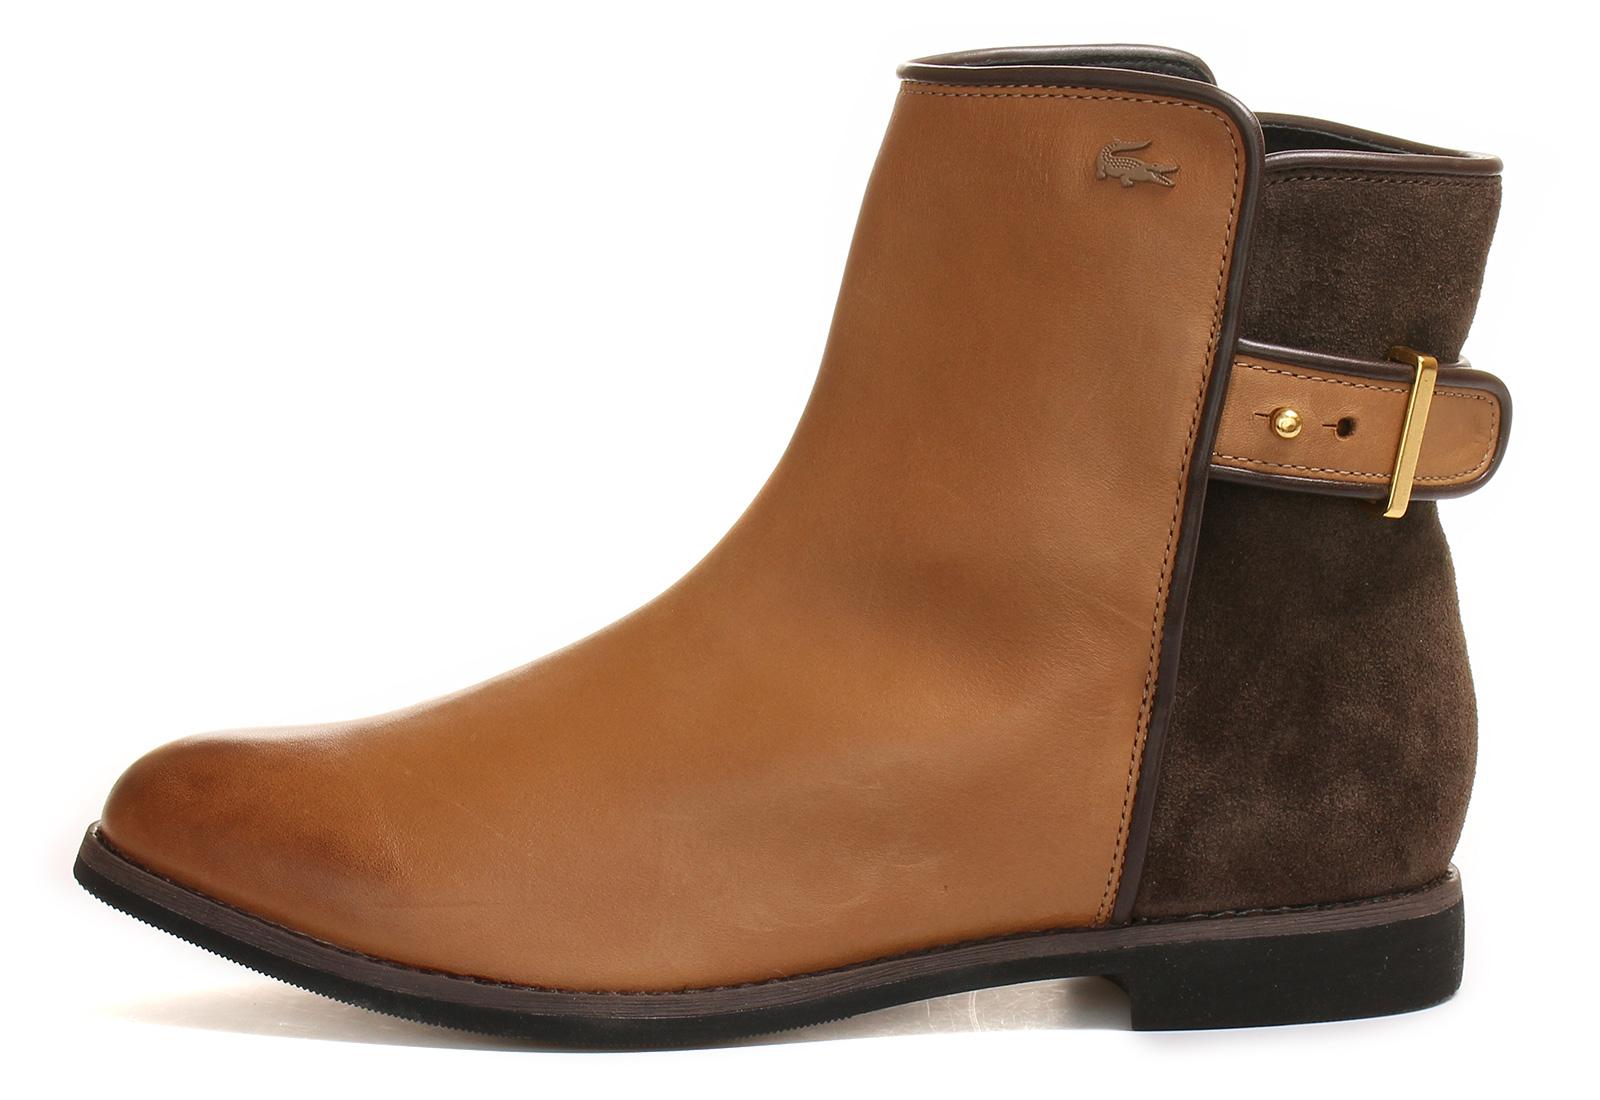 Lacoste Csizma - Rosemont Chelsea - 133srw0155-013 - Office Shoes ... ae4b0f956d